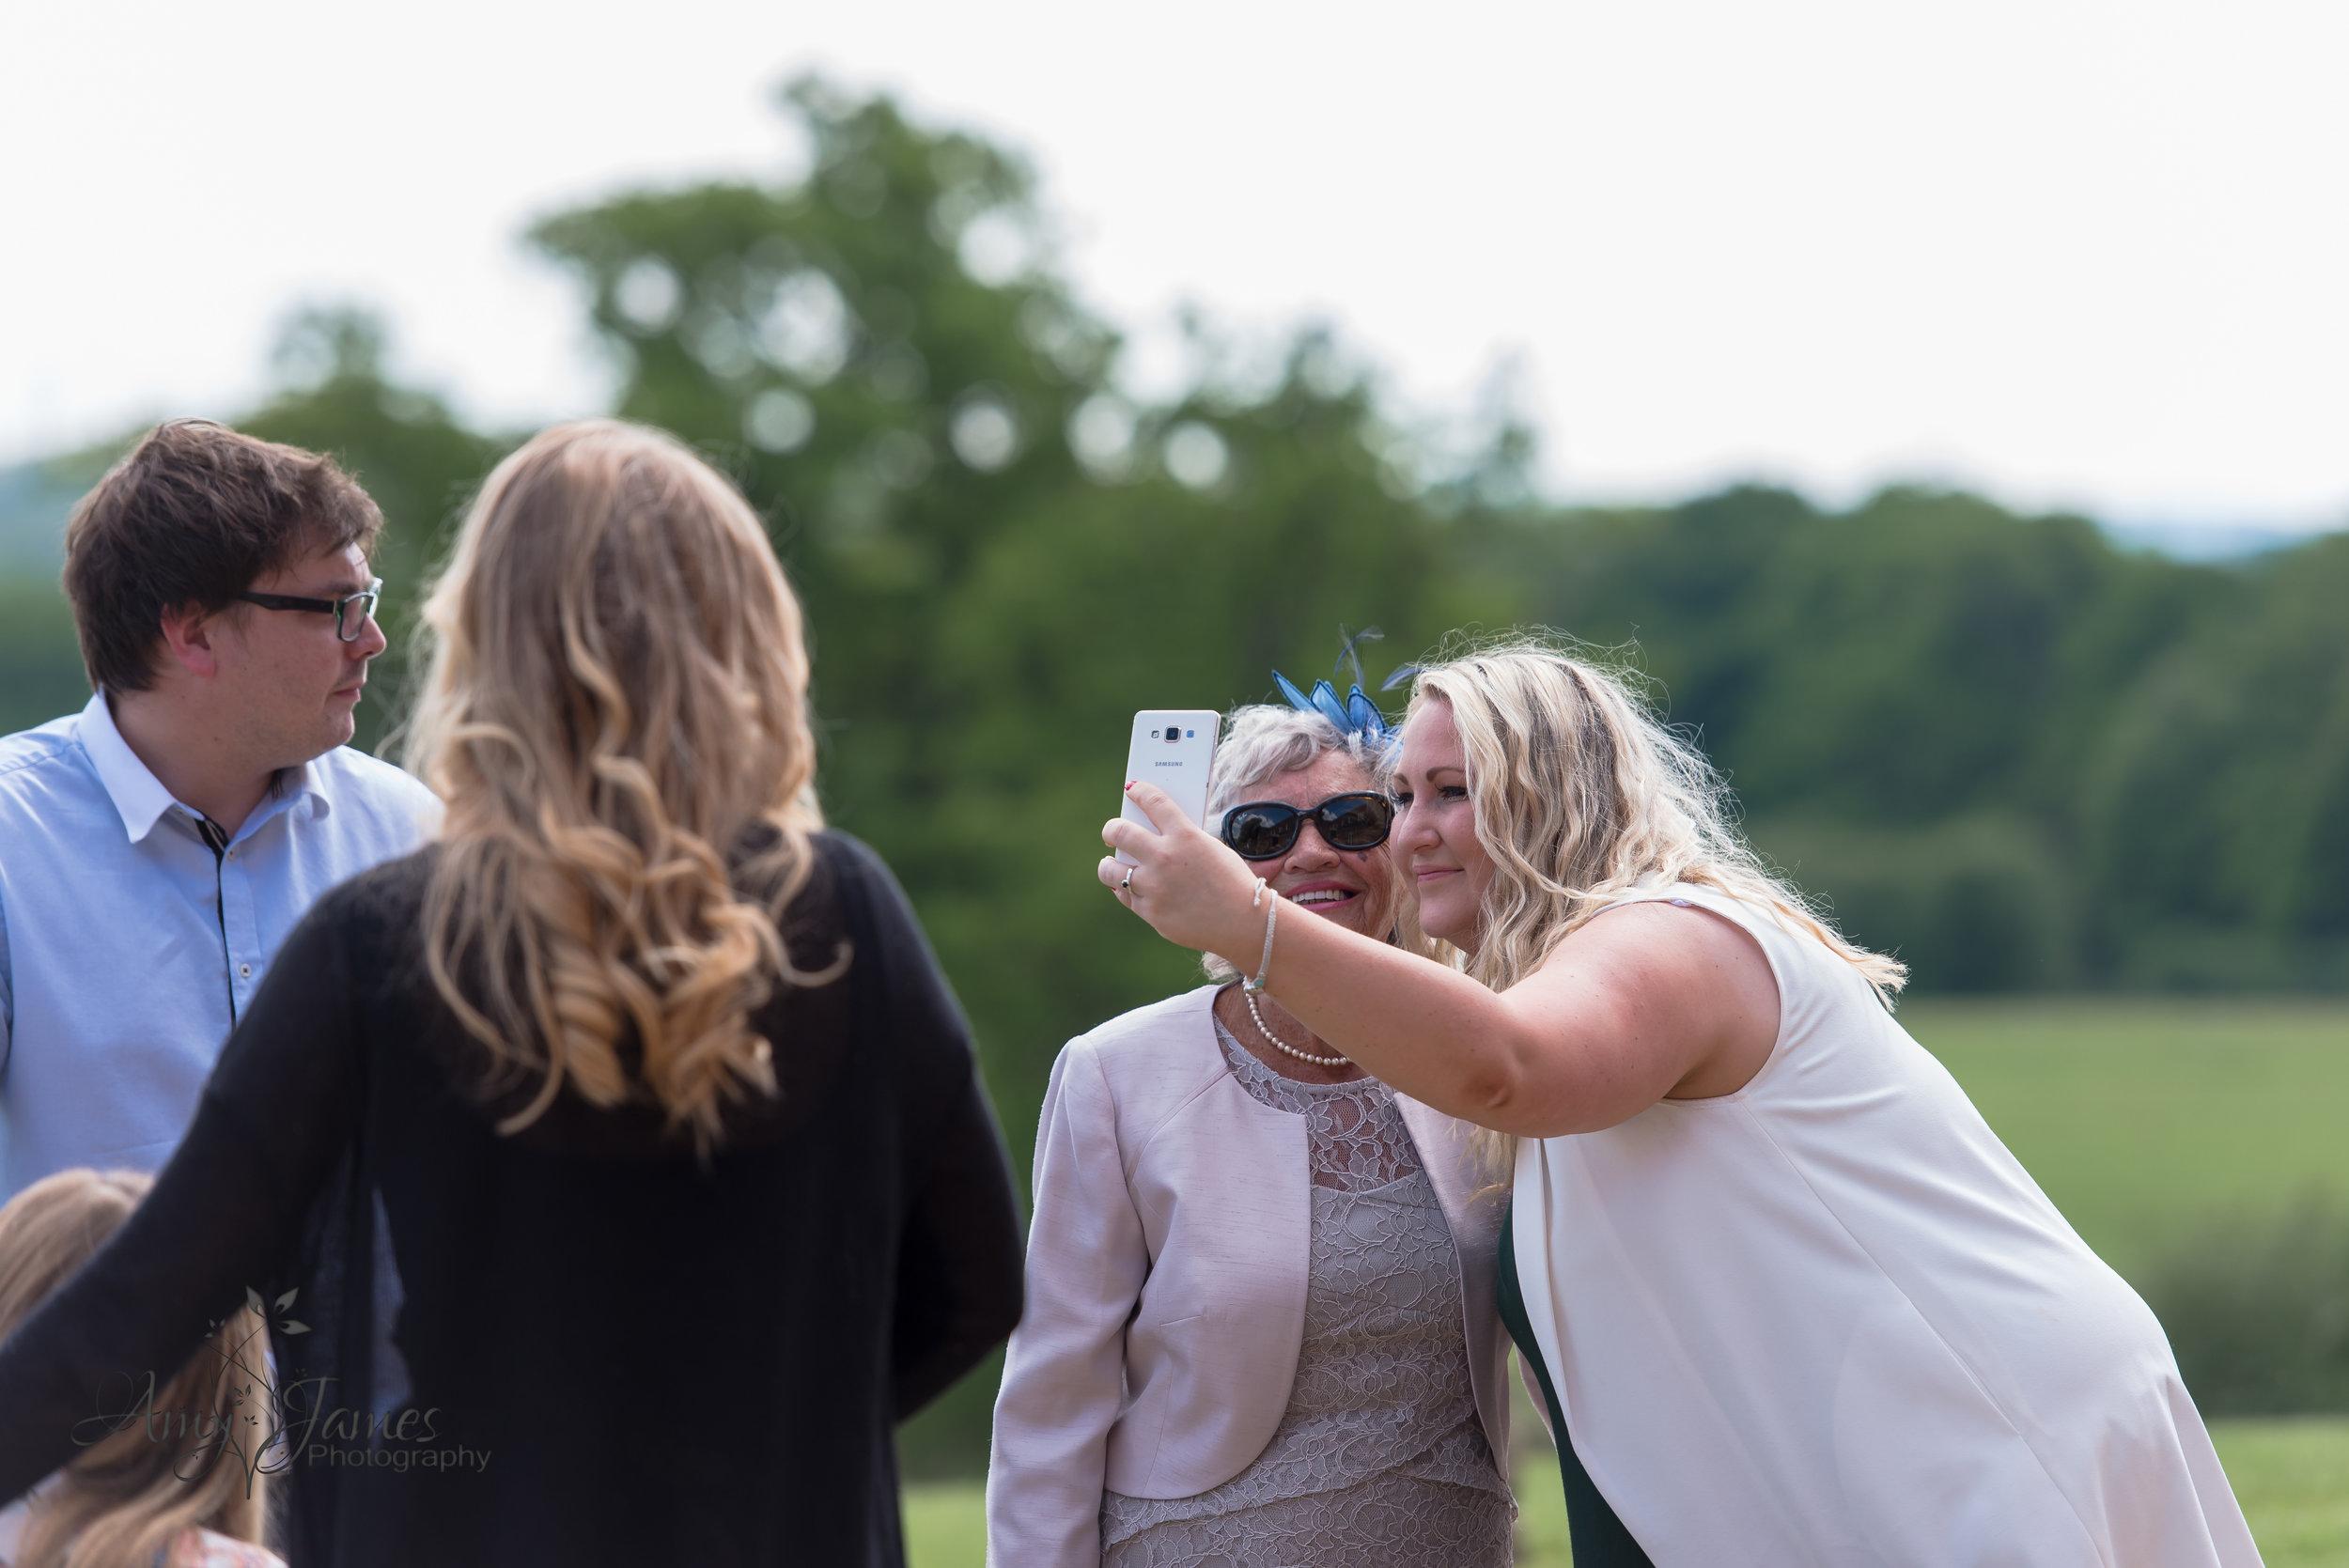 Highfield Park Wedding photographer | Hampshire wedding photographer | Fleet wedding photographer | UK outdoor wedding venue